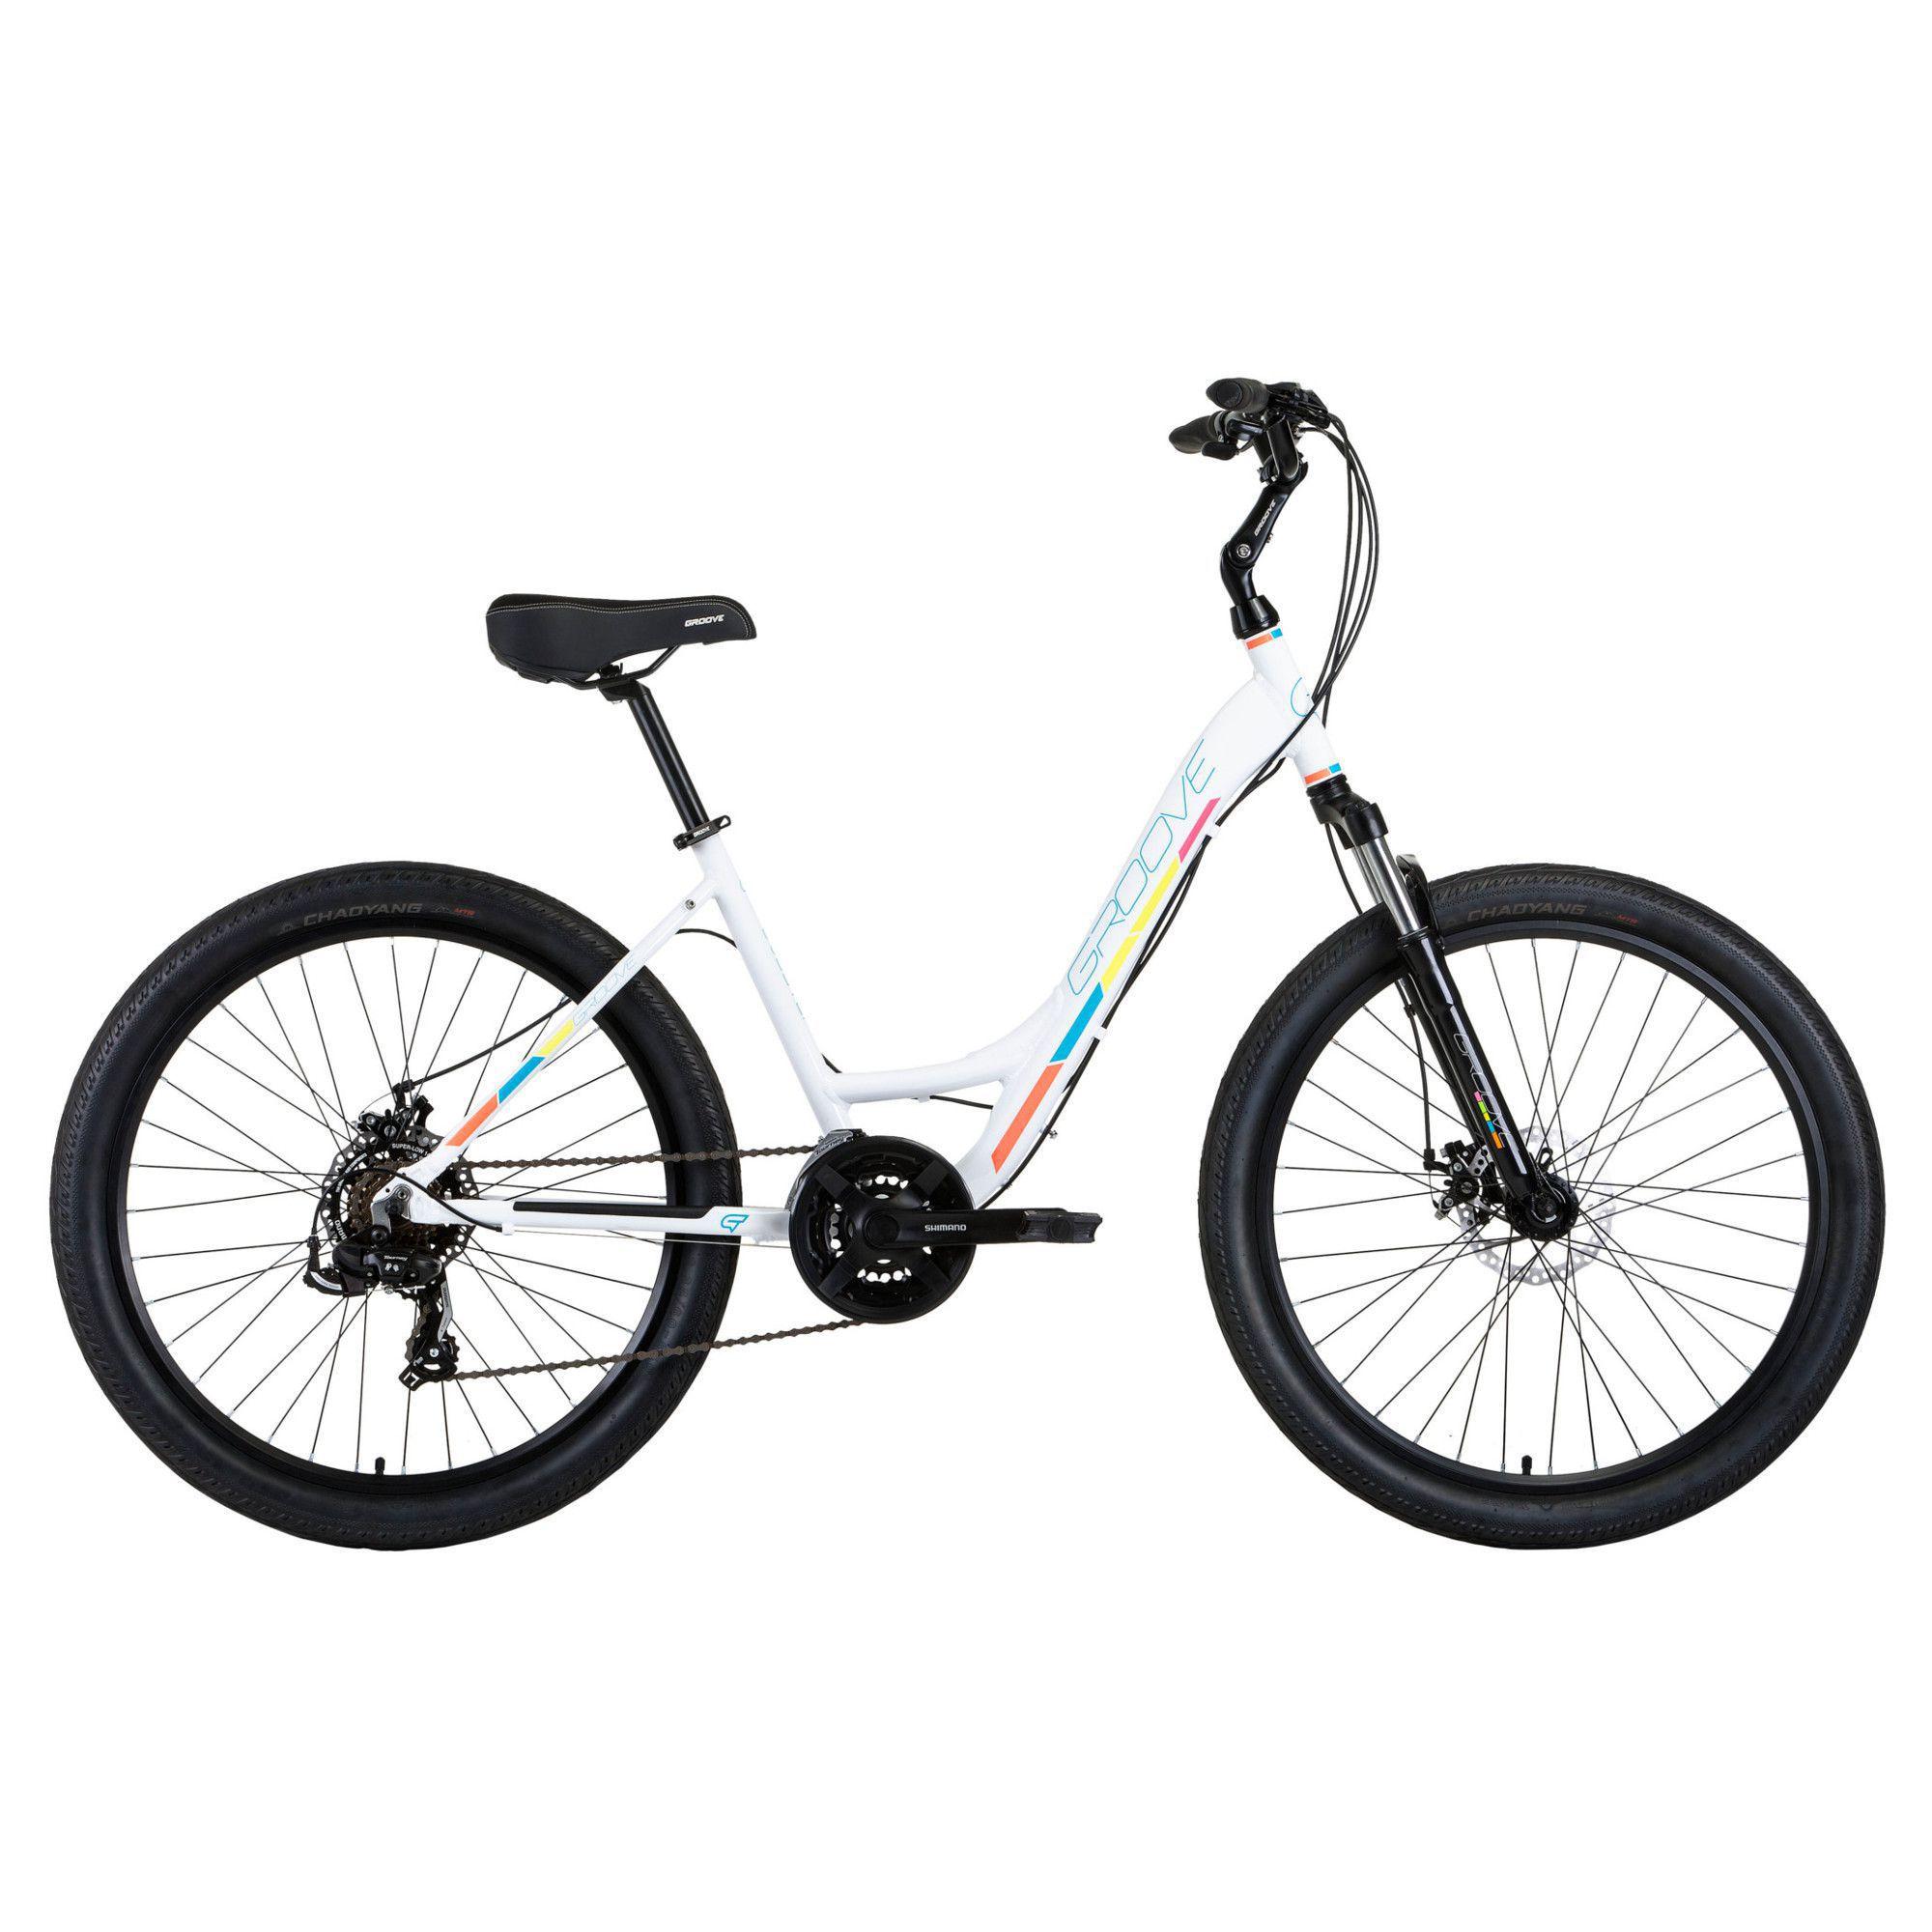 Bicicleta Urbana Groove Dubstep 21v